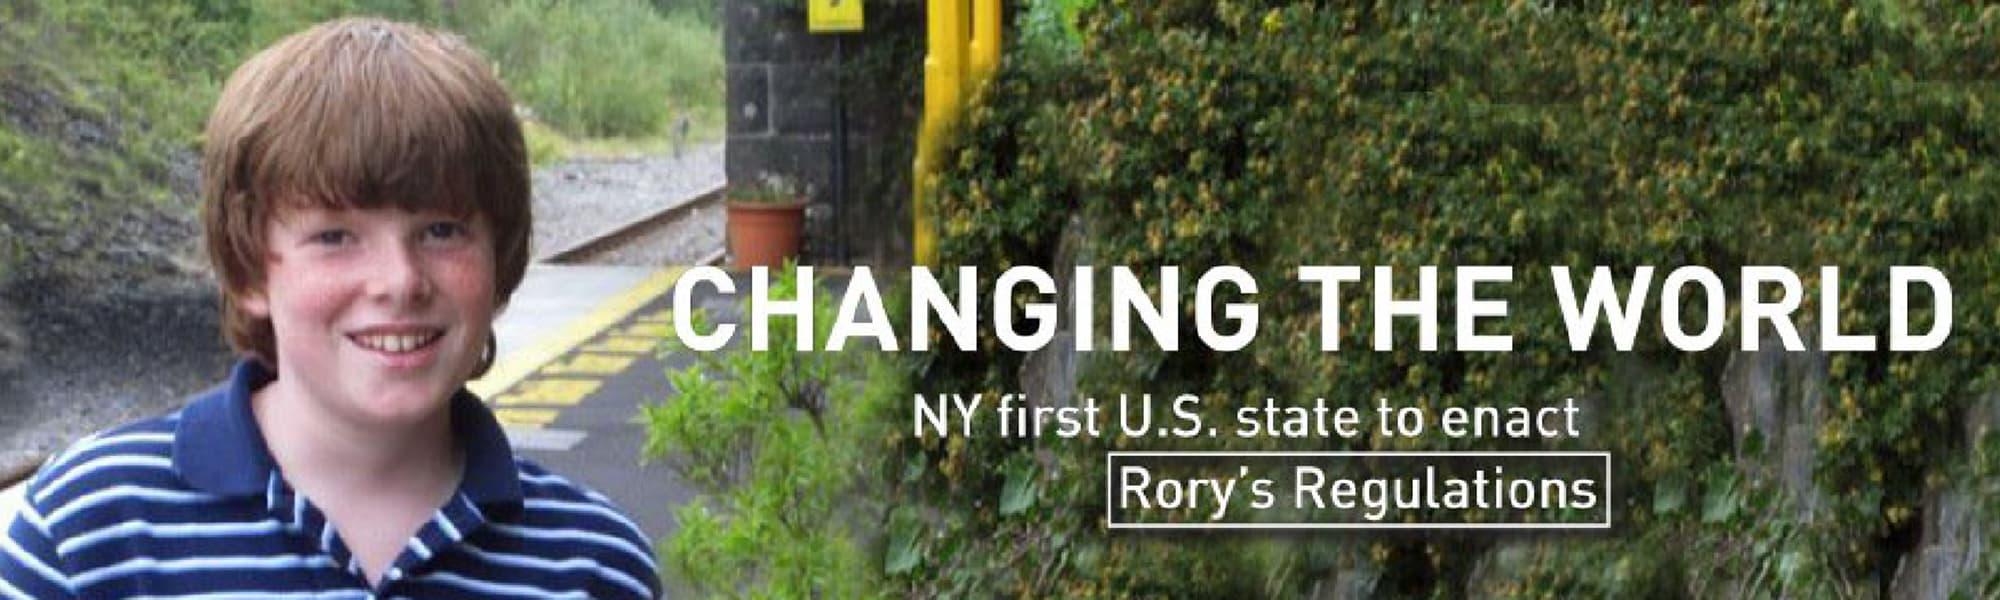 Rory Staunton Rory's Regulations Sepsis Guidelines New York State.jpg